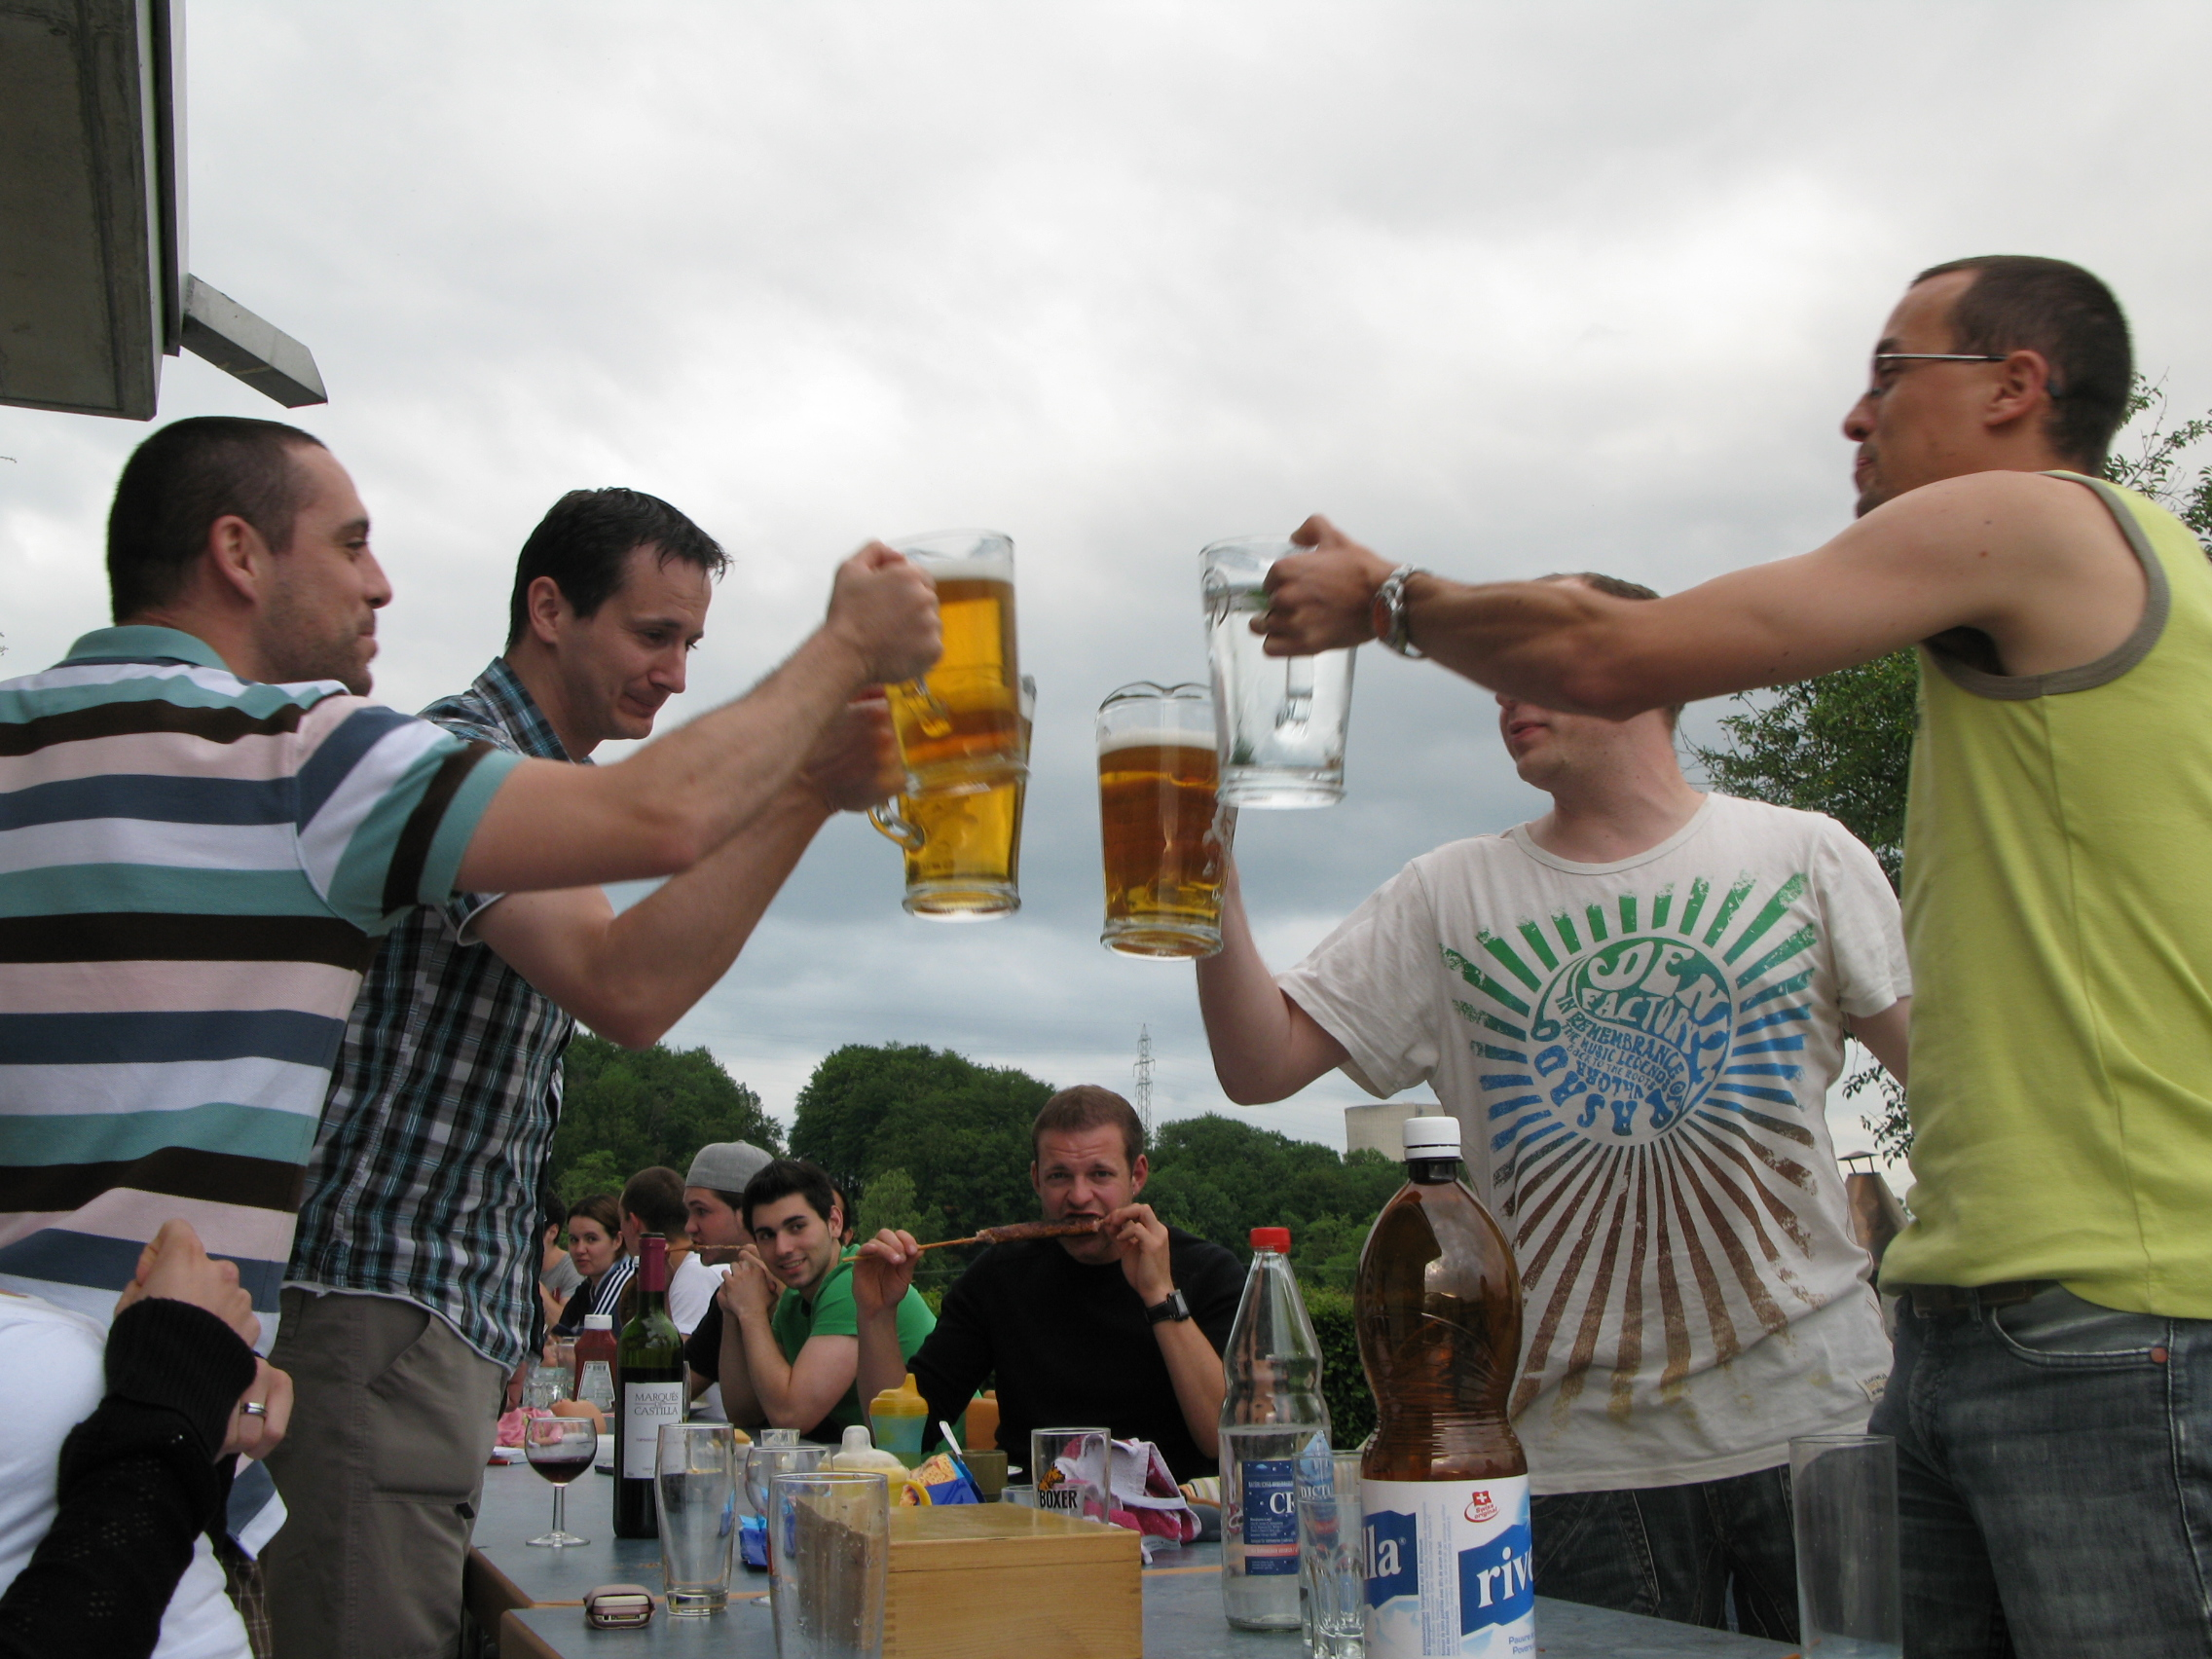 Abschlussfest 1. Mannschaft 2010